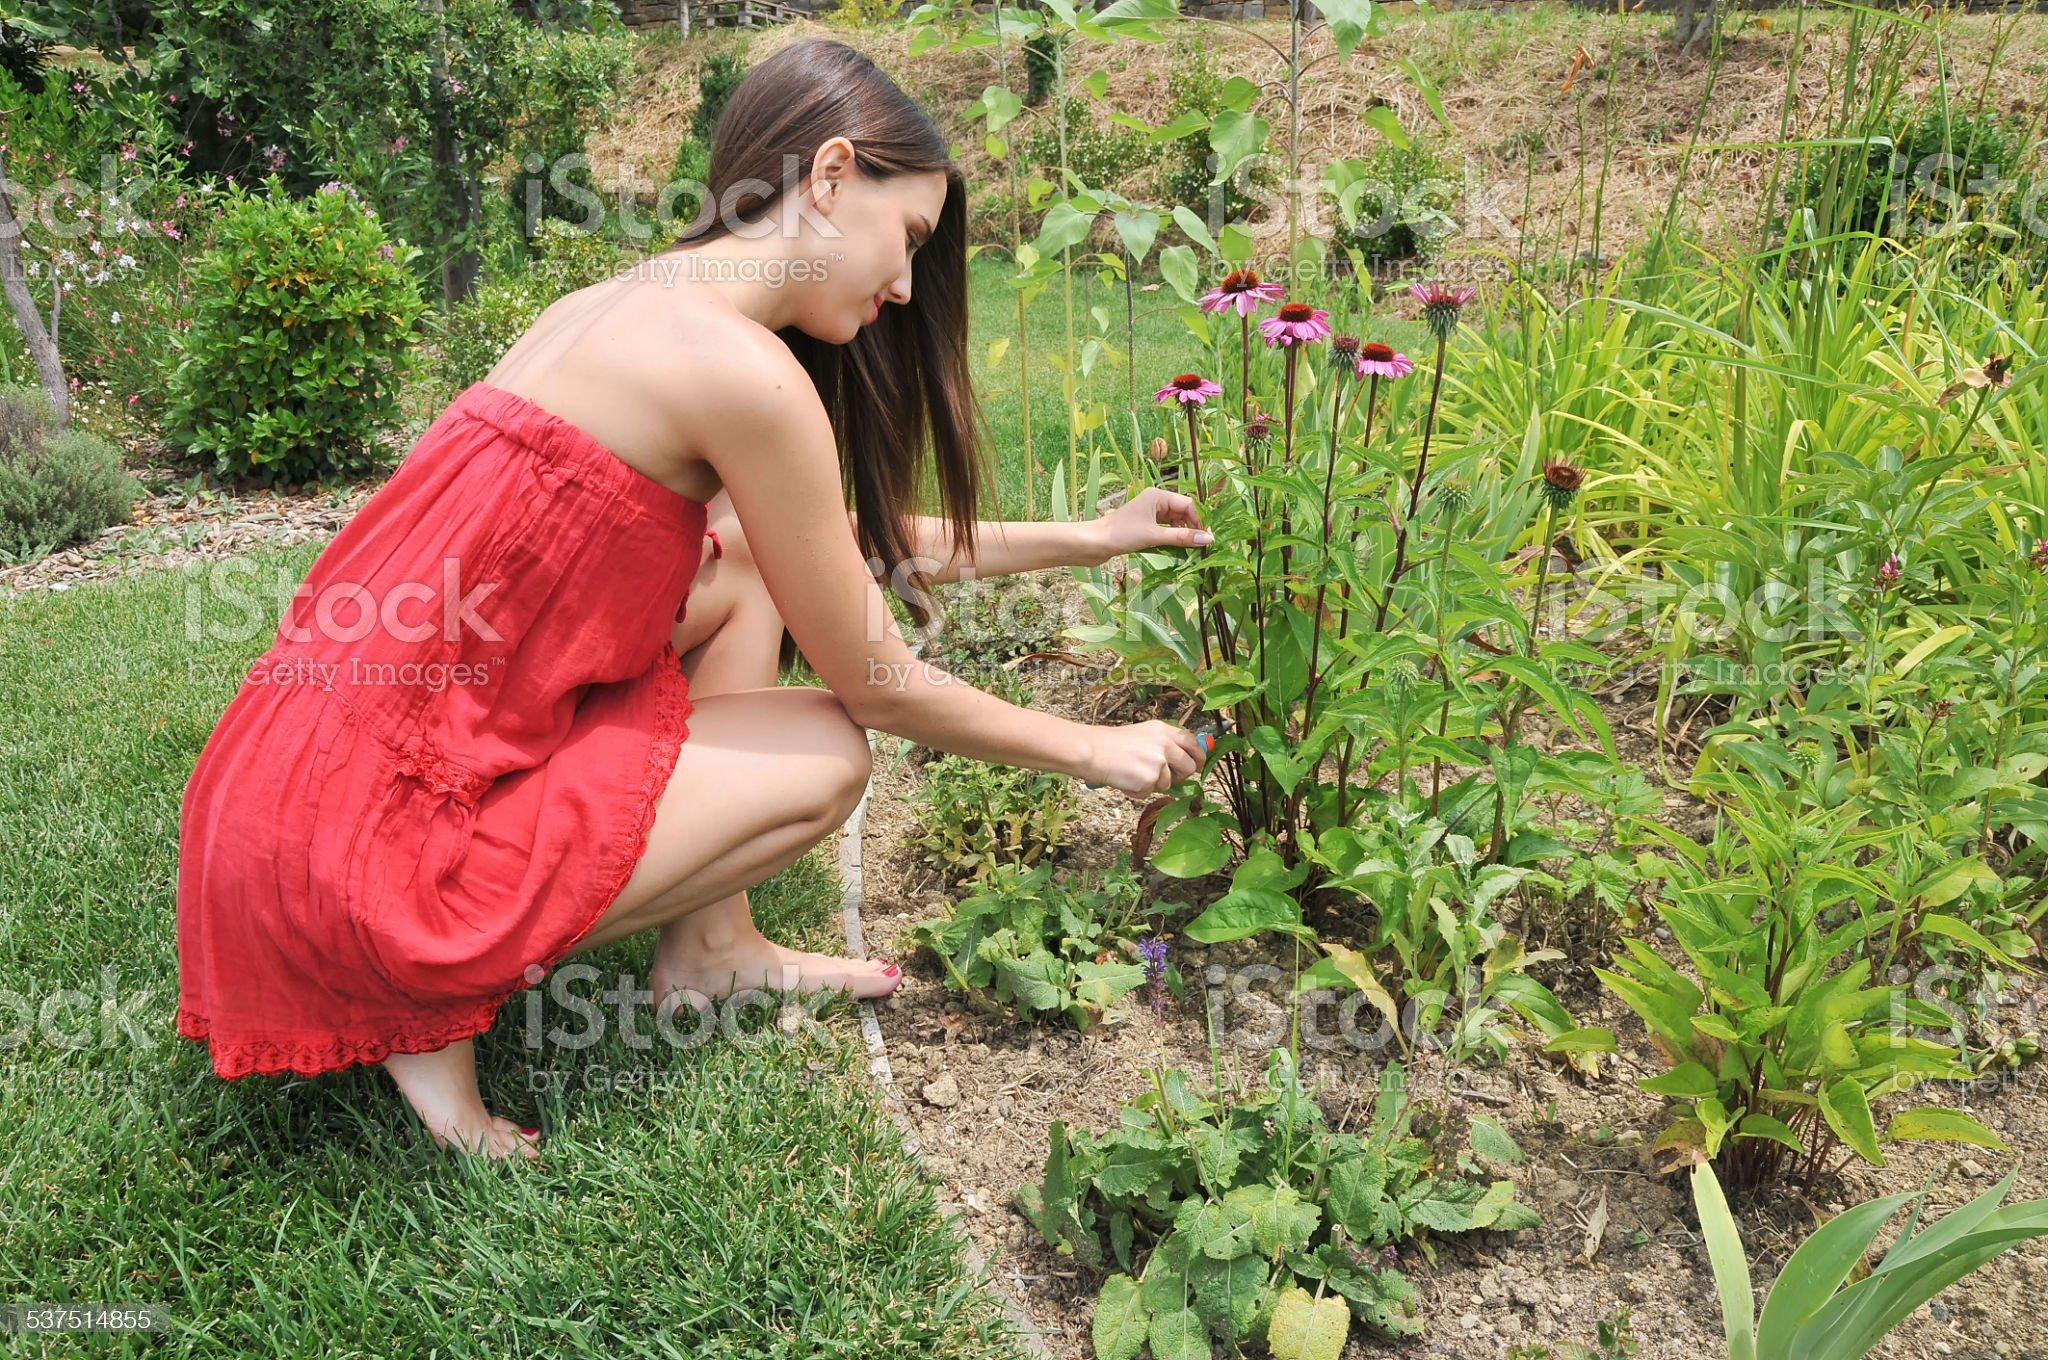 https://media.istockphoto.com/photos/gardening-picture-id537514855?s=2048x2048